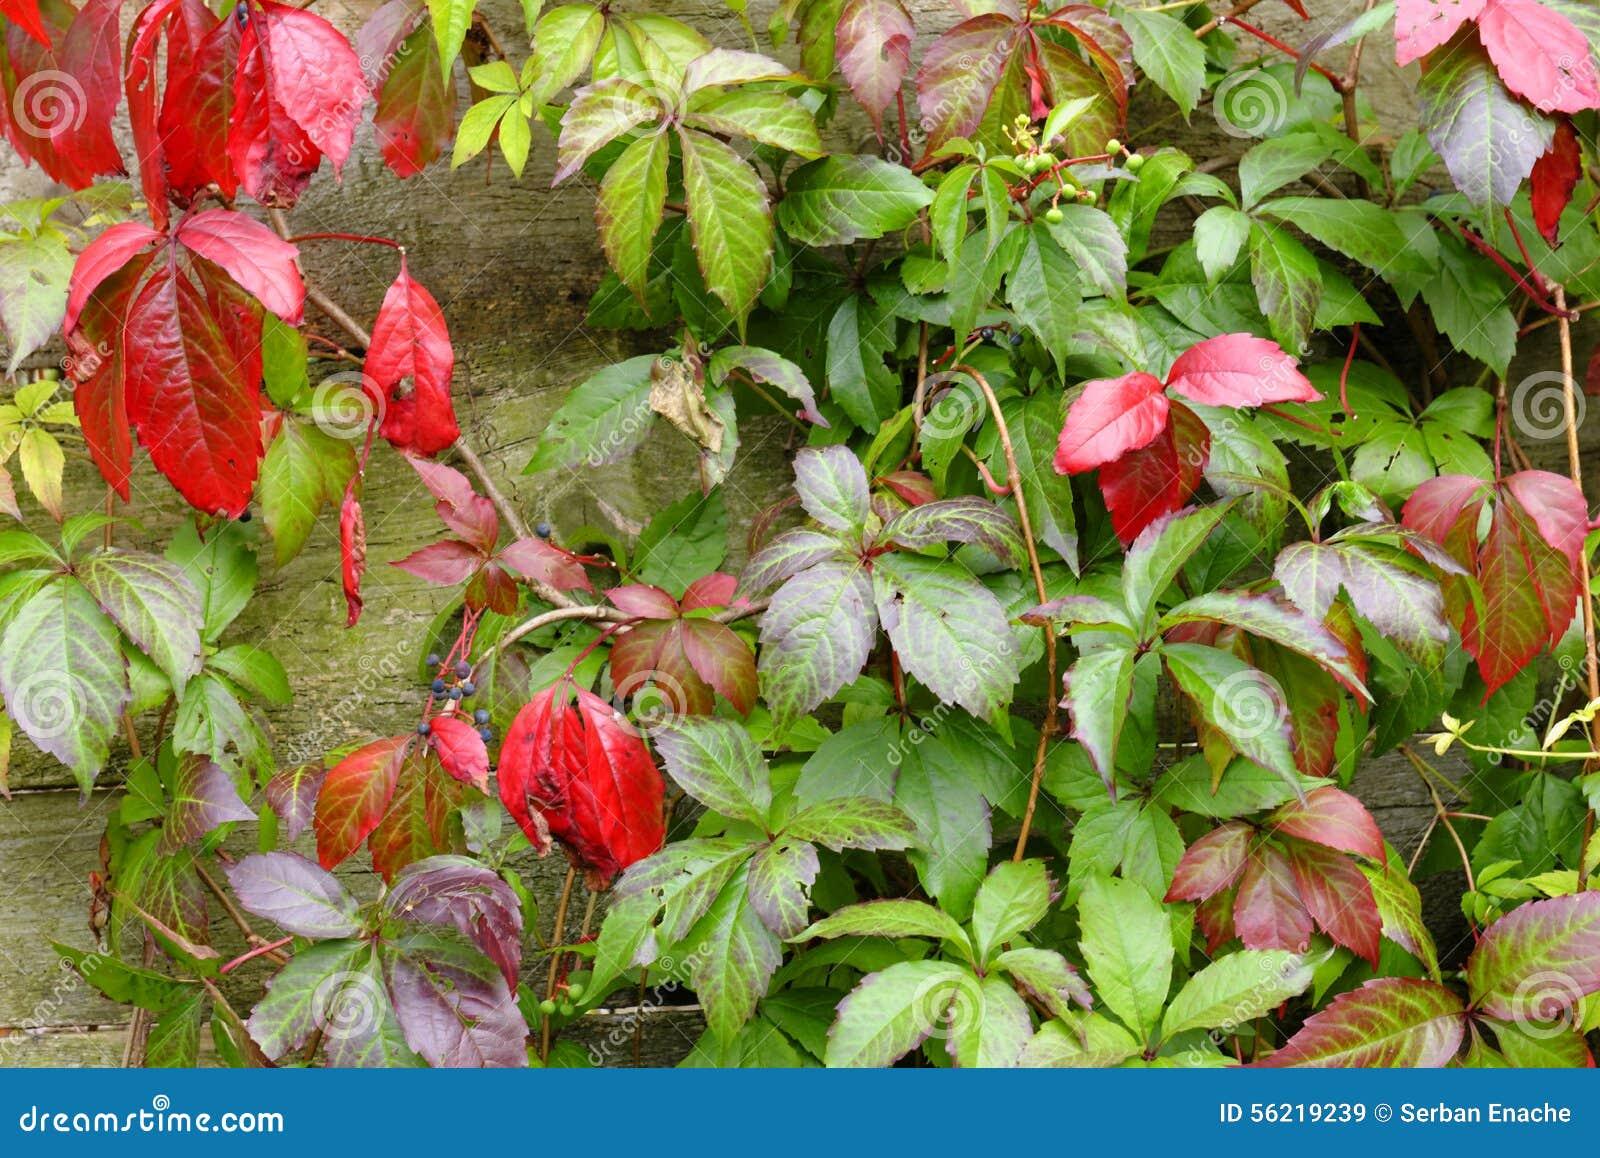 Pianta Foglie Rosse E Verdi foglie rosse e verdi del parthenocissus immagine stock